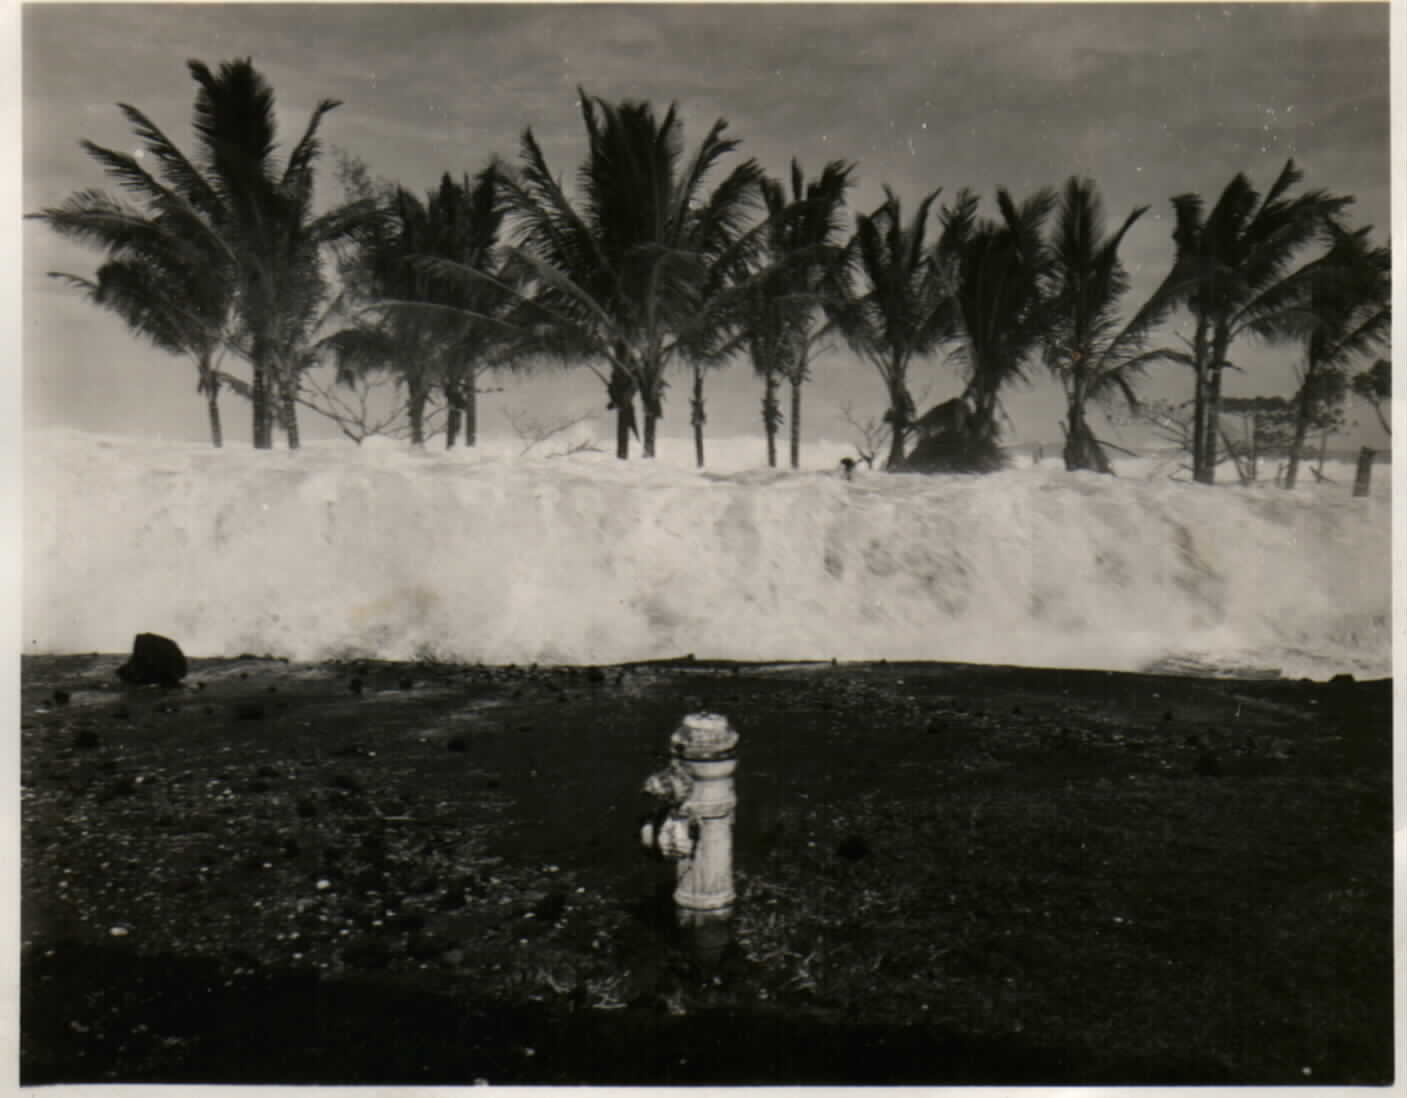 1946 tsunami survivor shares her story | Geophysical Institute